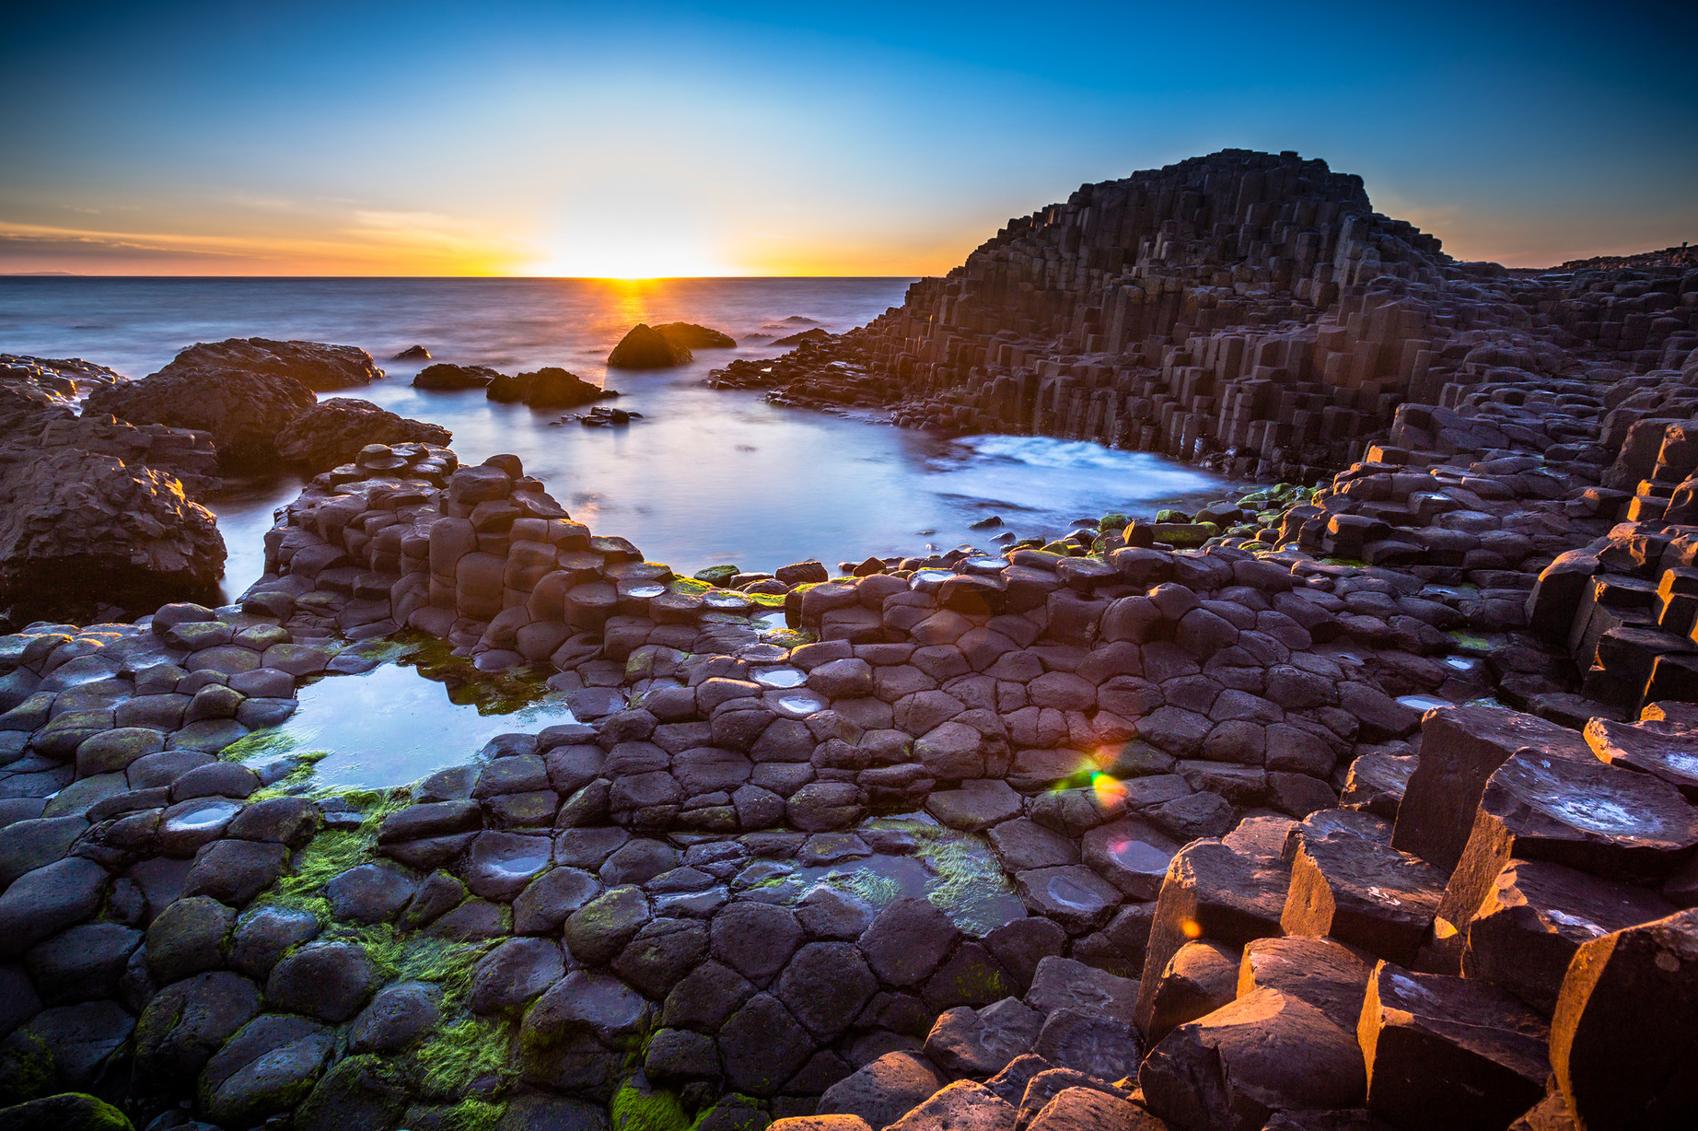 Ireland photos RS11778_NorthernIreland-GiantsCauseway-2016-479917040-lpr-©-AdamUprichard